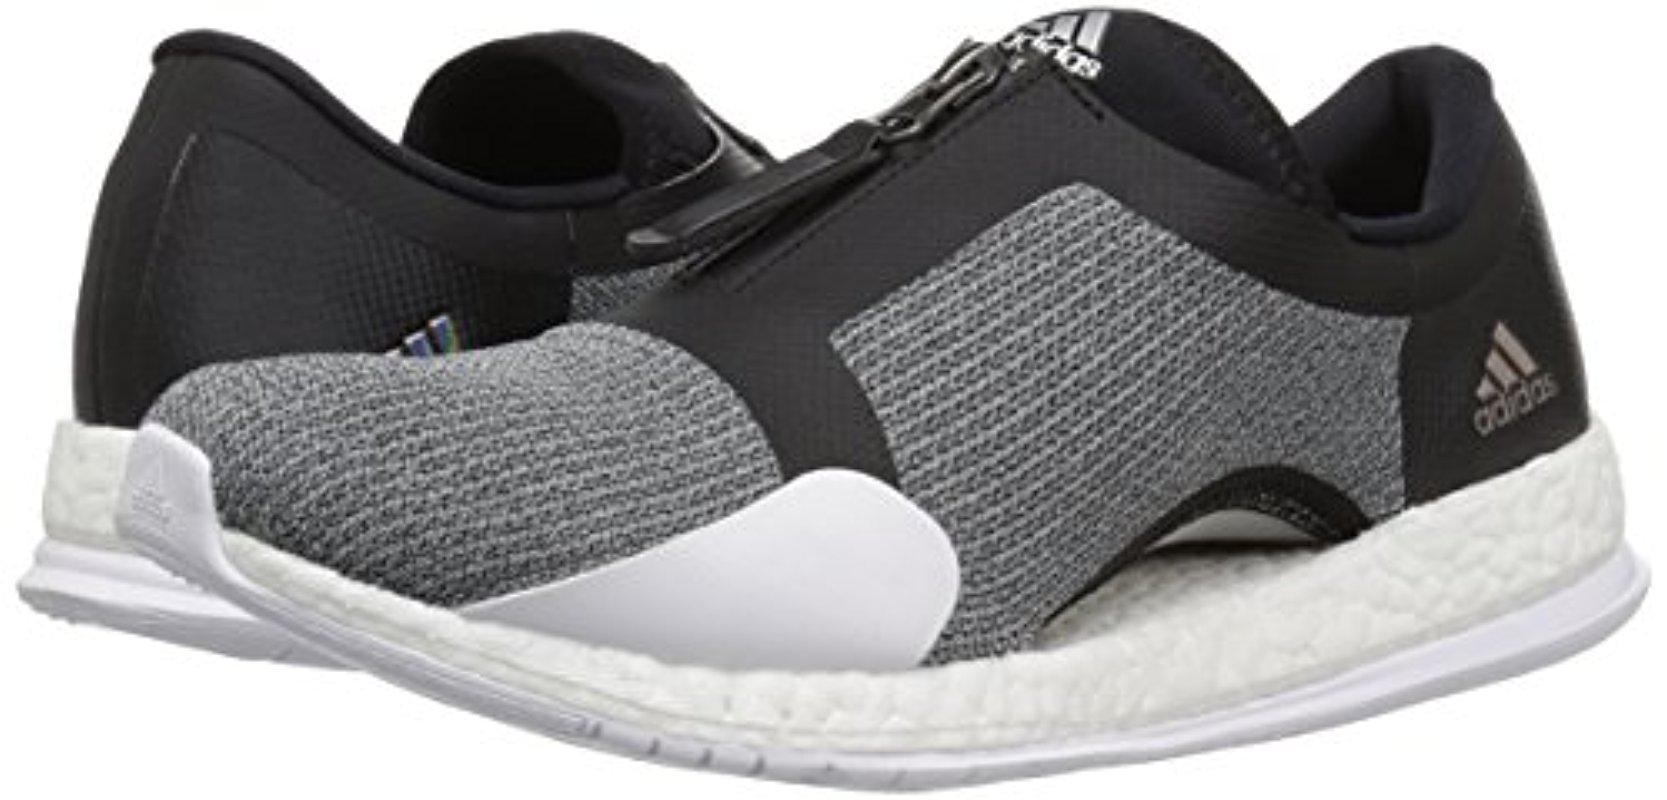 adidas Pureboost X Tr Zip Running Shoe - Lyst